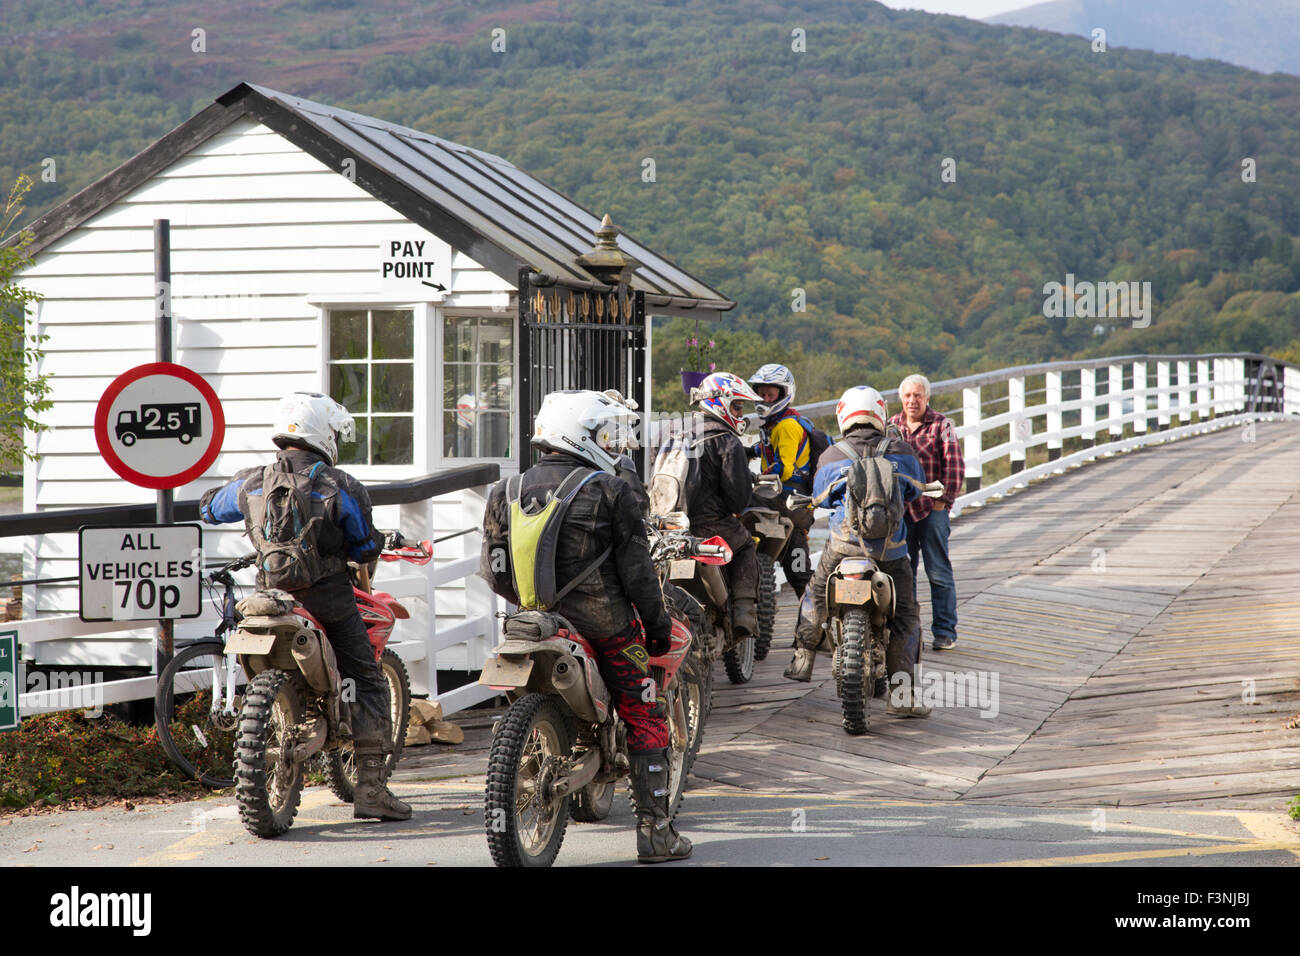 Trail bikers on Penmaenpool wooden toll bridge crossing the River Mawddach, Snowdonia National Park, Gwynedd, North - Stock Image